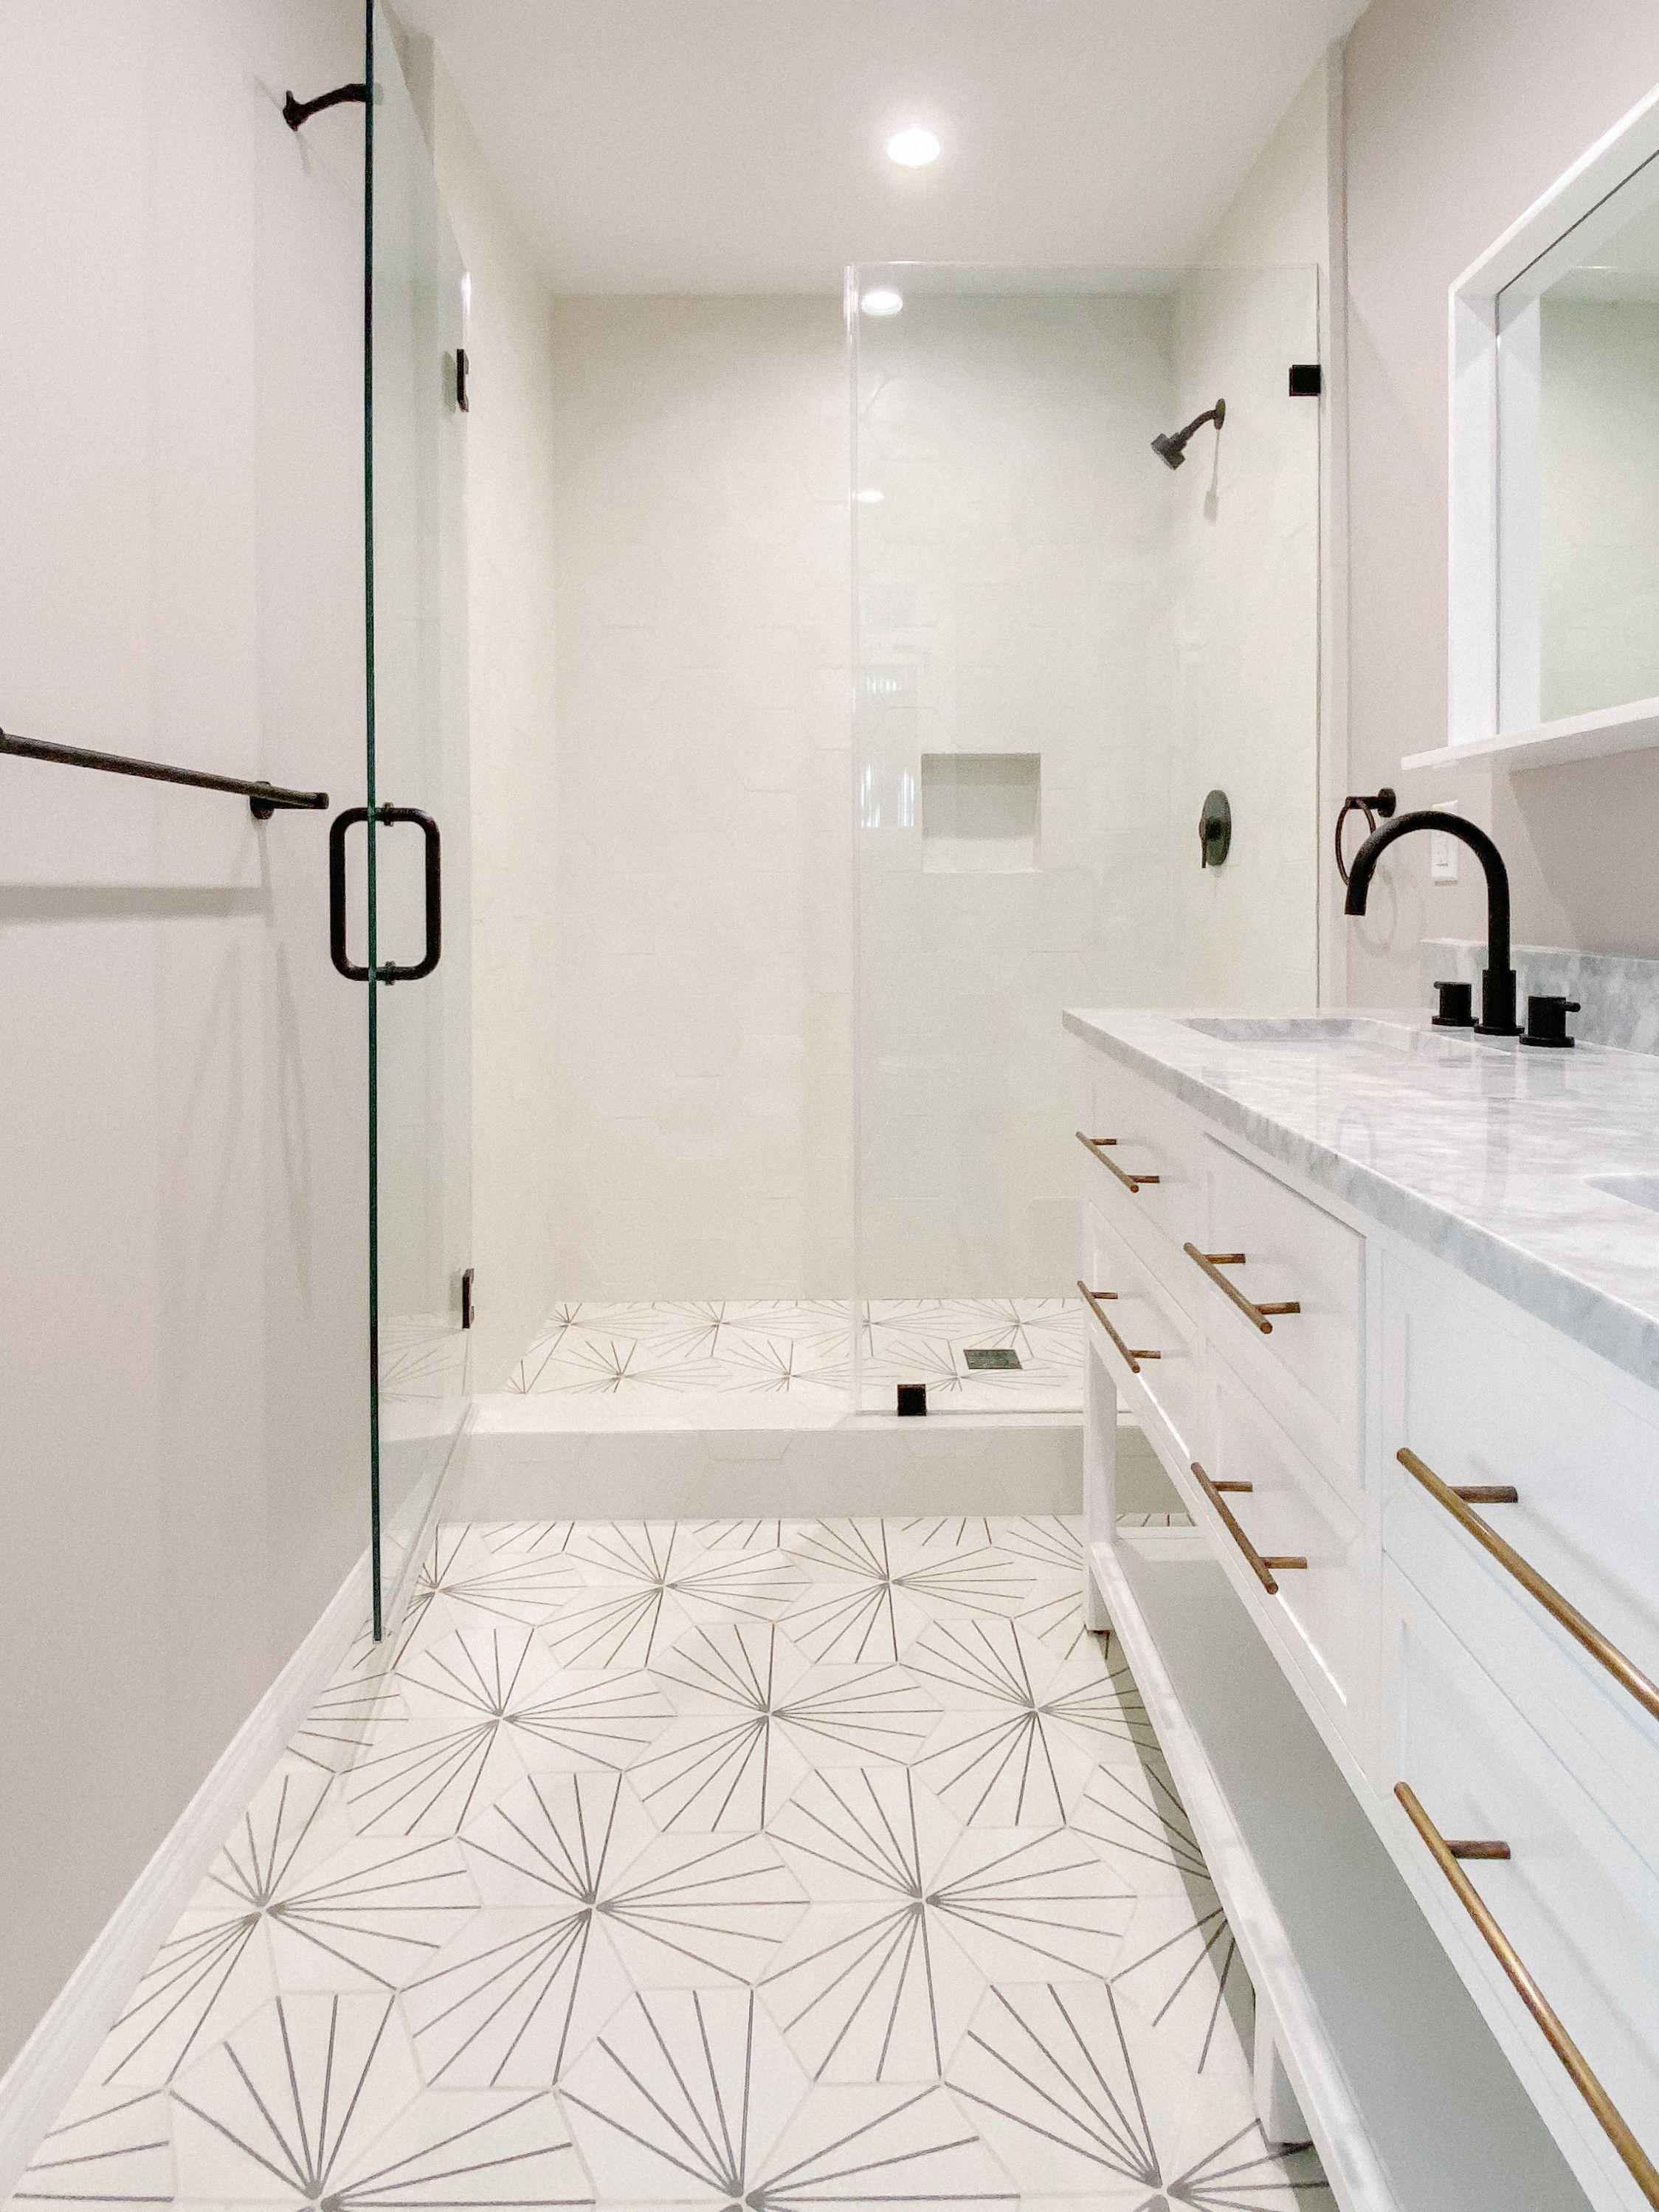 Linear Pattern Cement Hexagon Tile Bathroom Modern Bathroom Design Bathroom Design White Hexagon Tiles